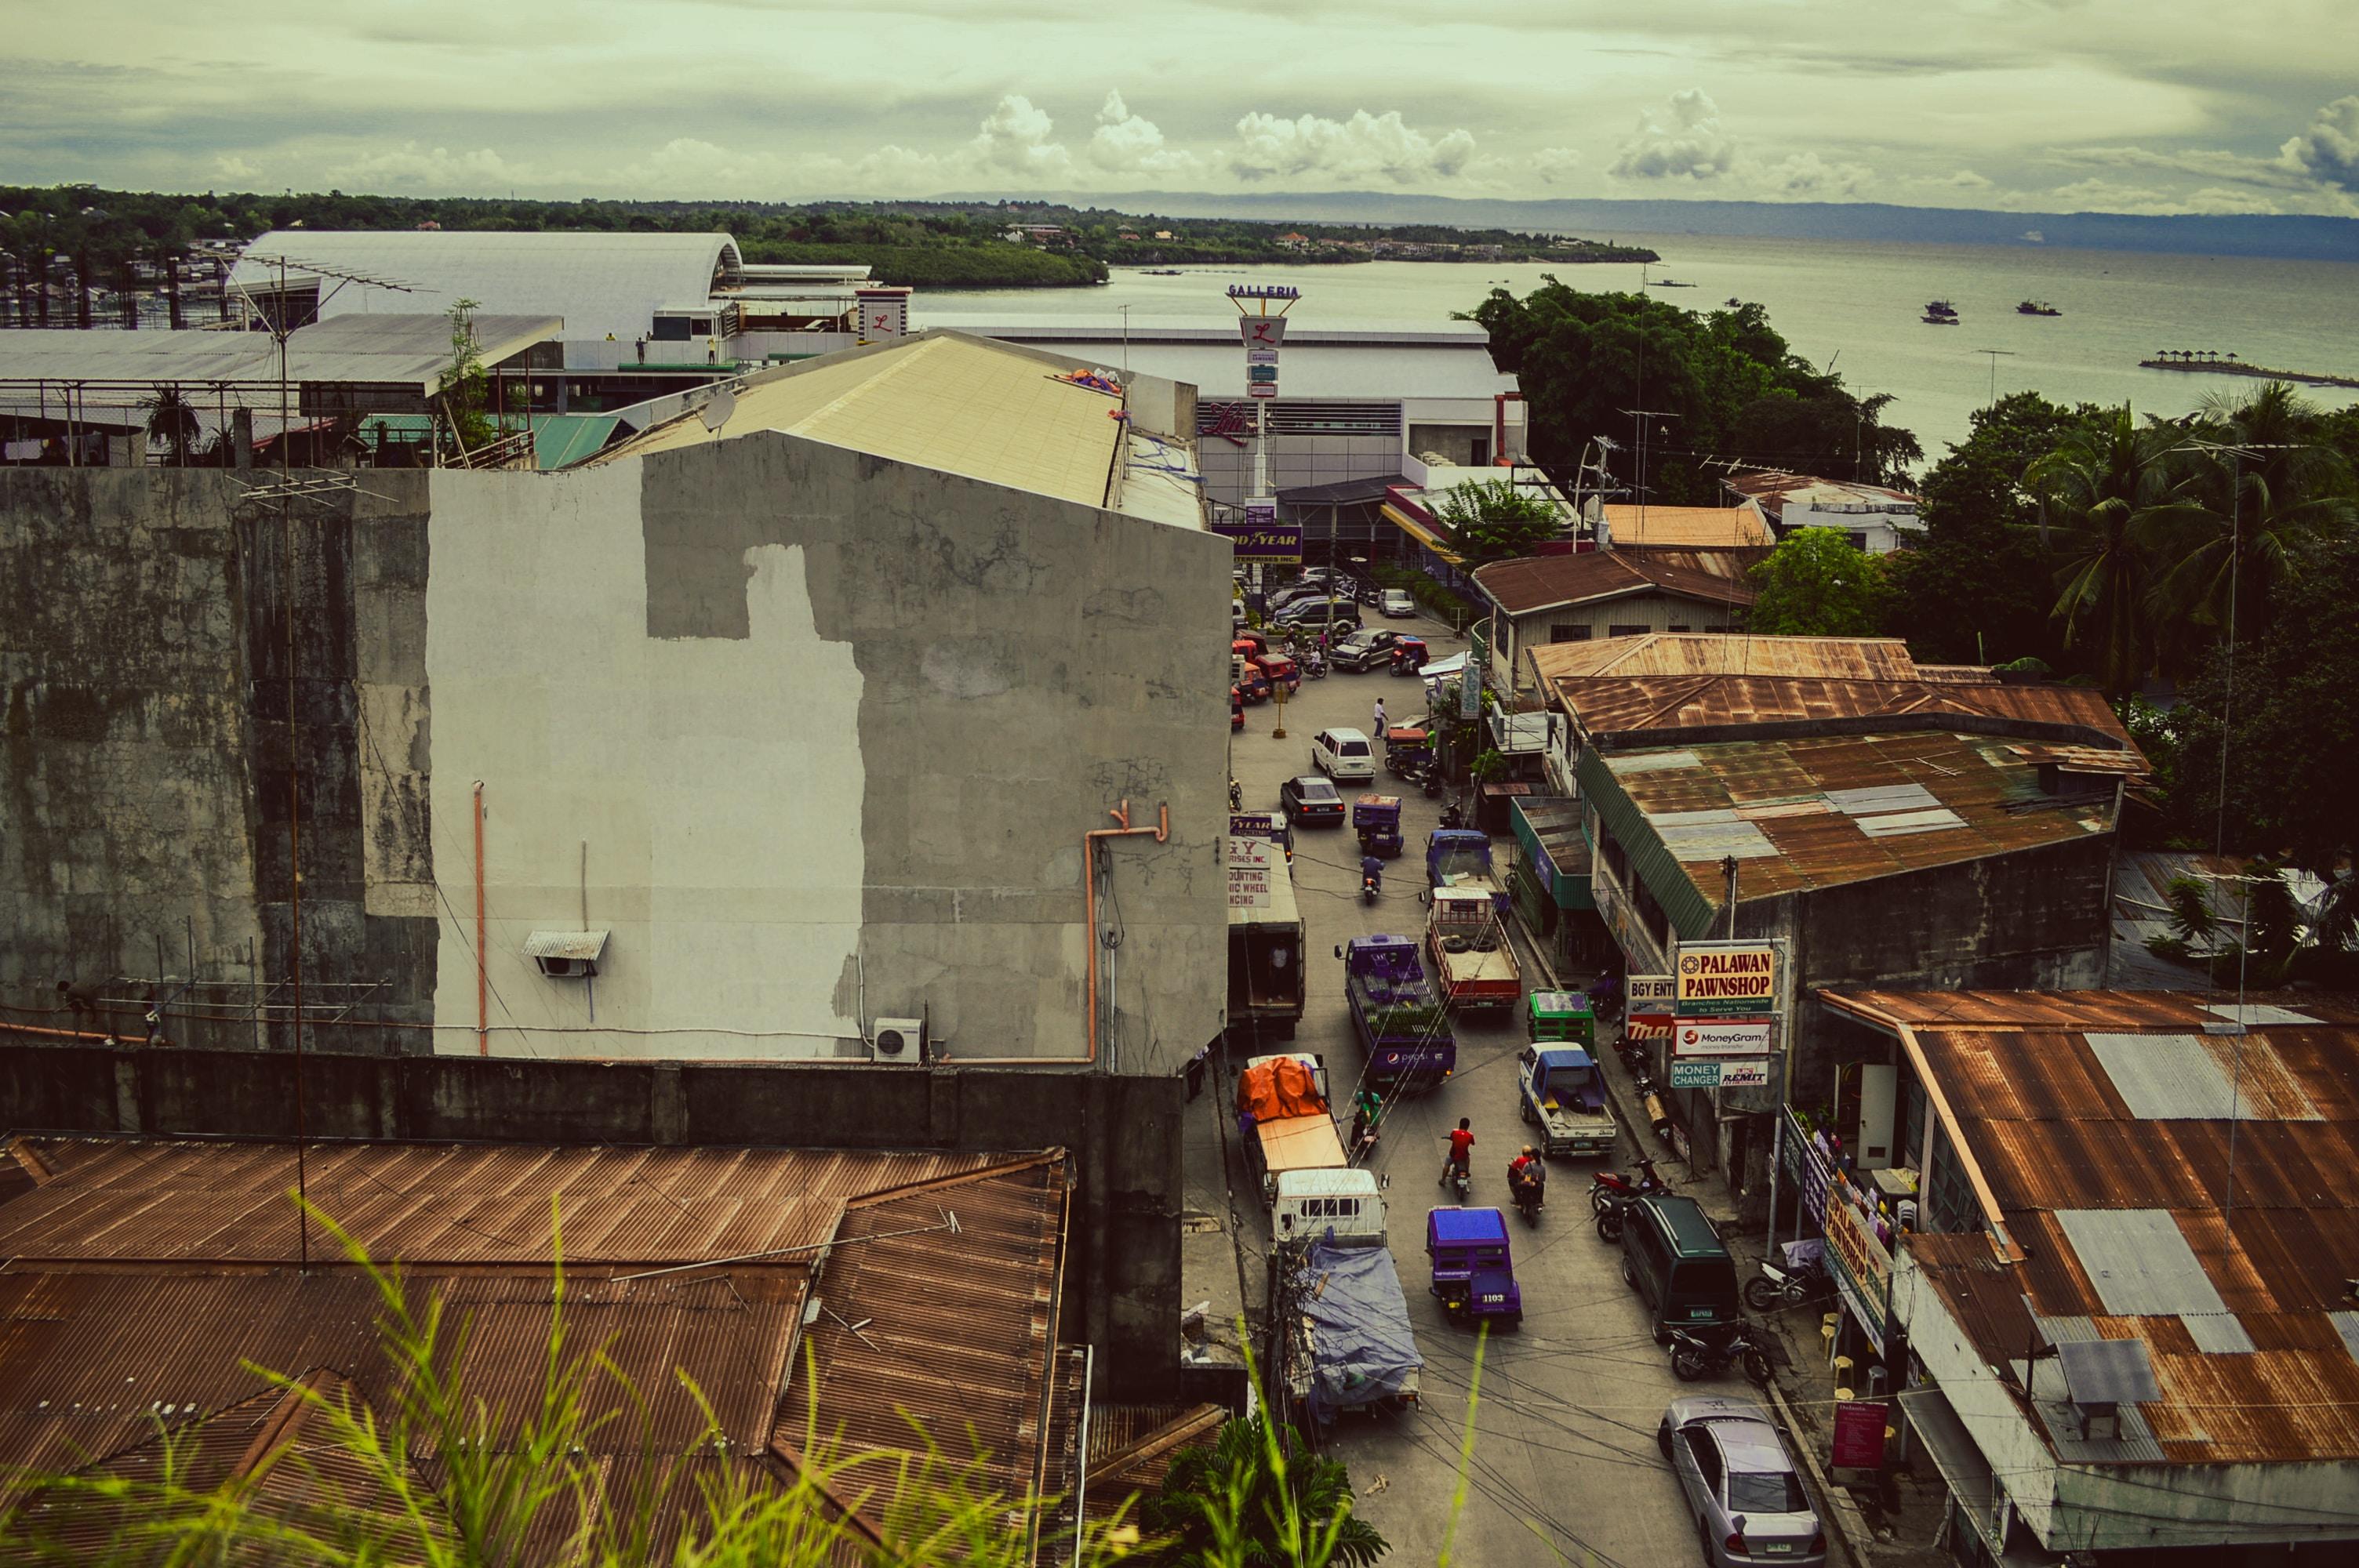 Free Unsplash photo from Reyven Biloy